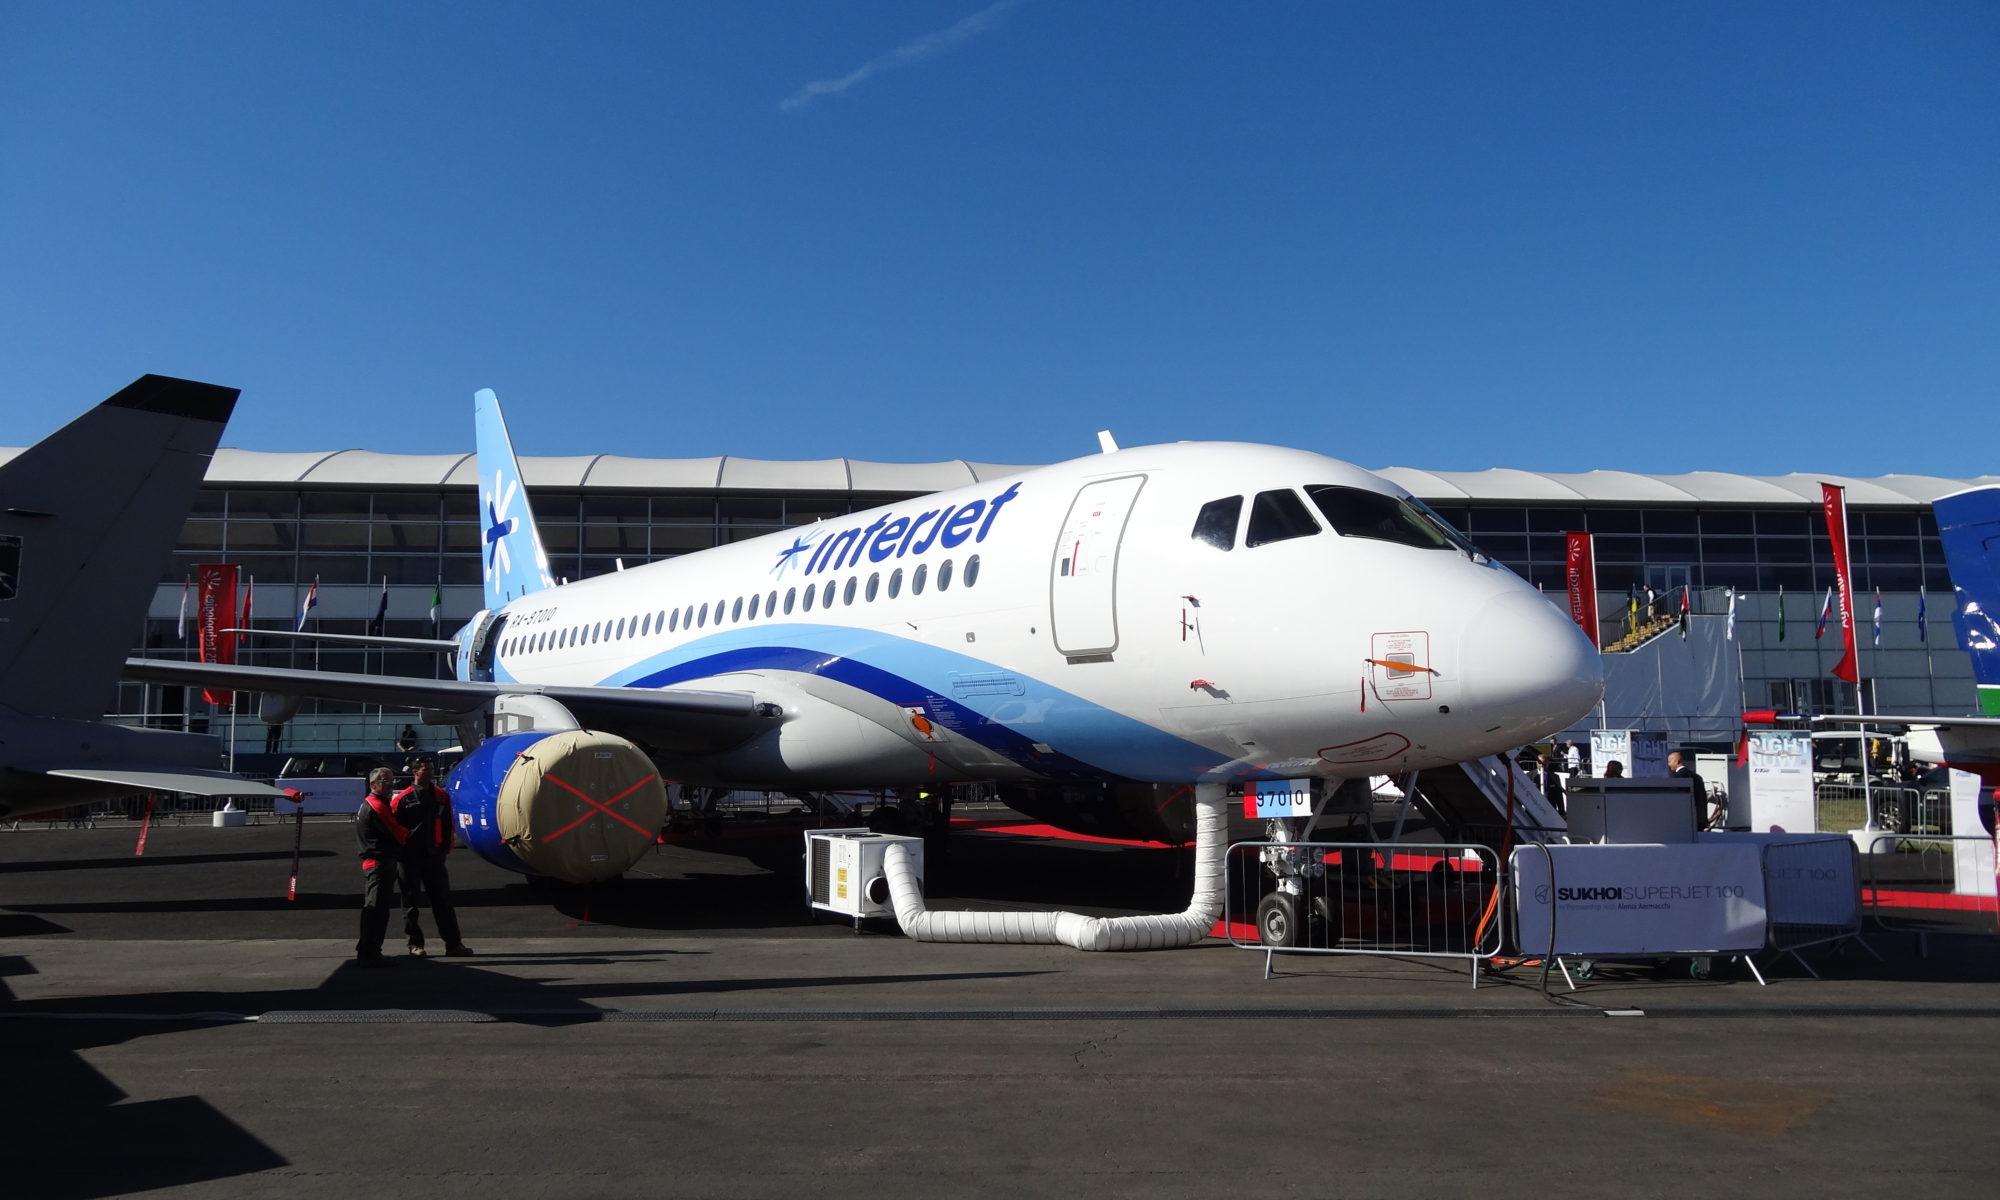 Sukhoi Superjet 100 (SSJ)